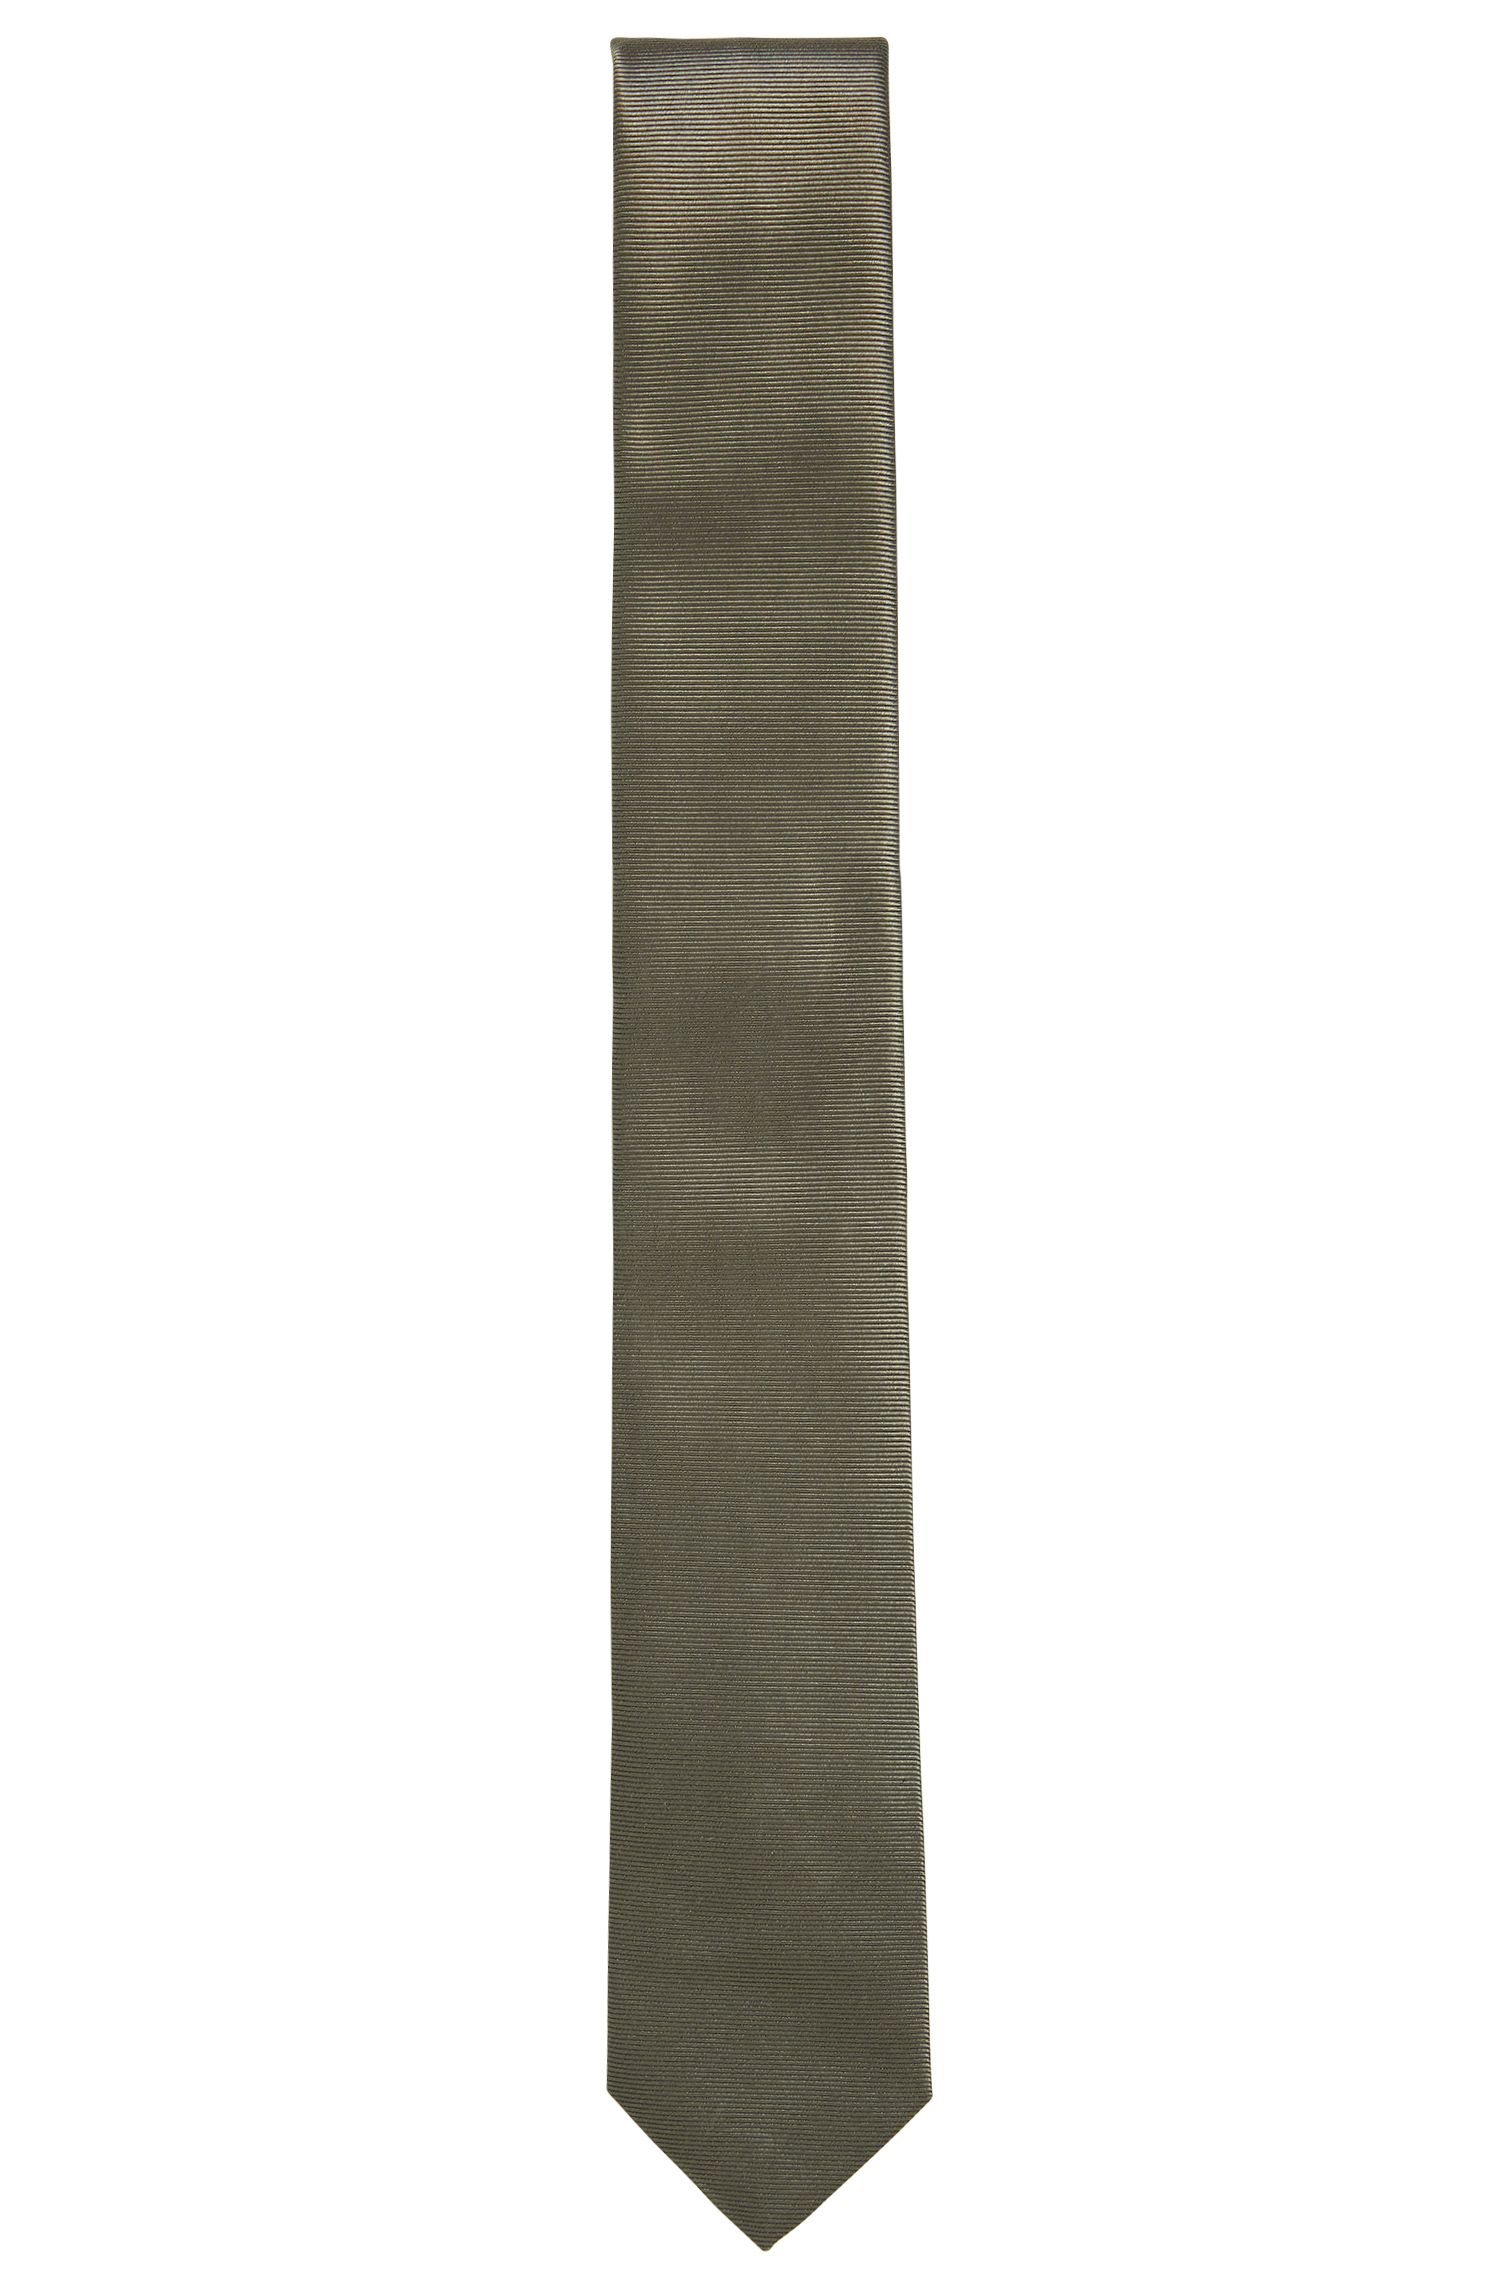 BOSS Tailored Italian Silk Slim Tie, Dark Green